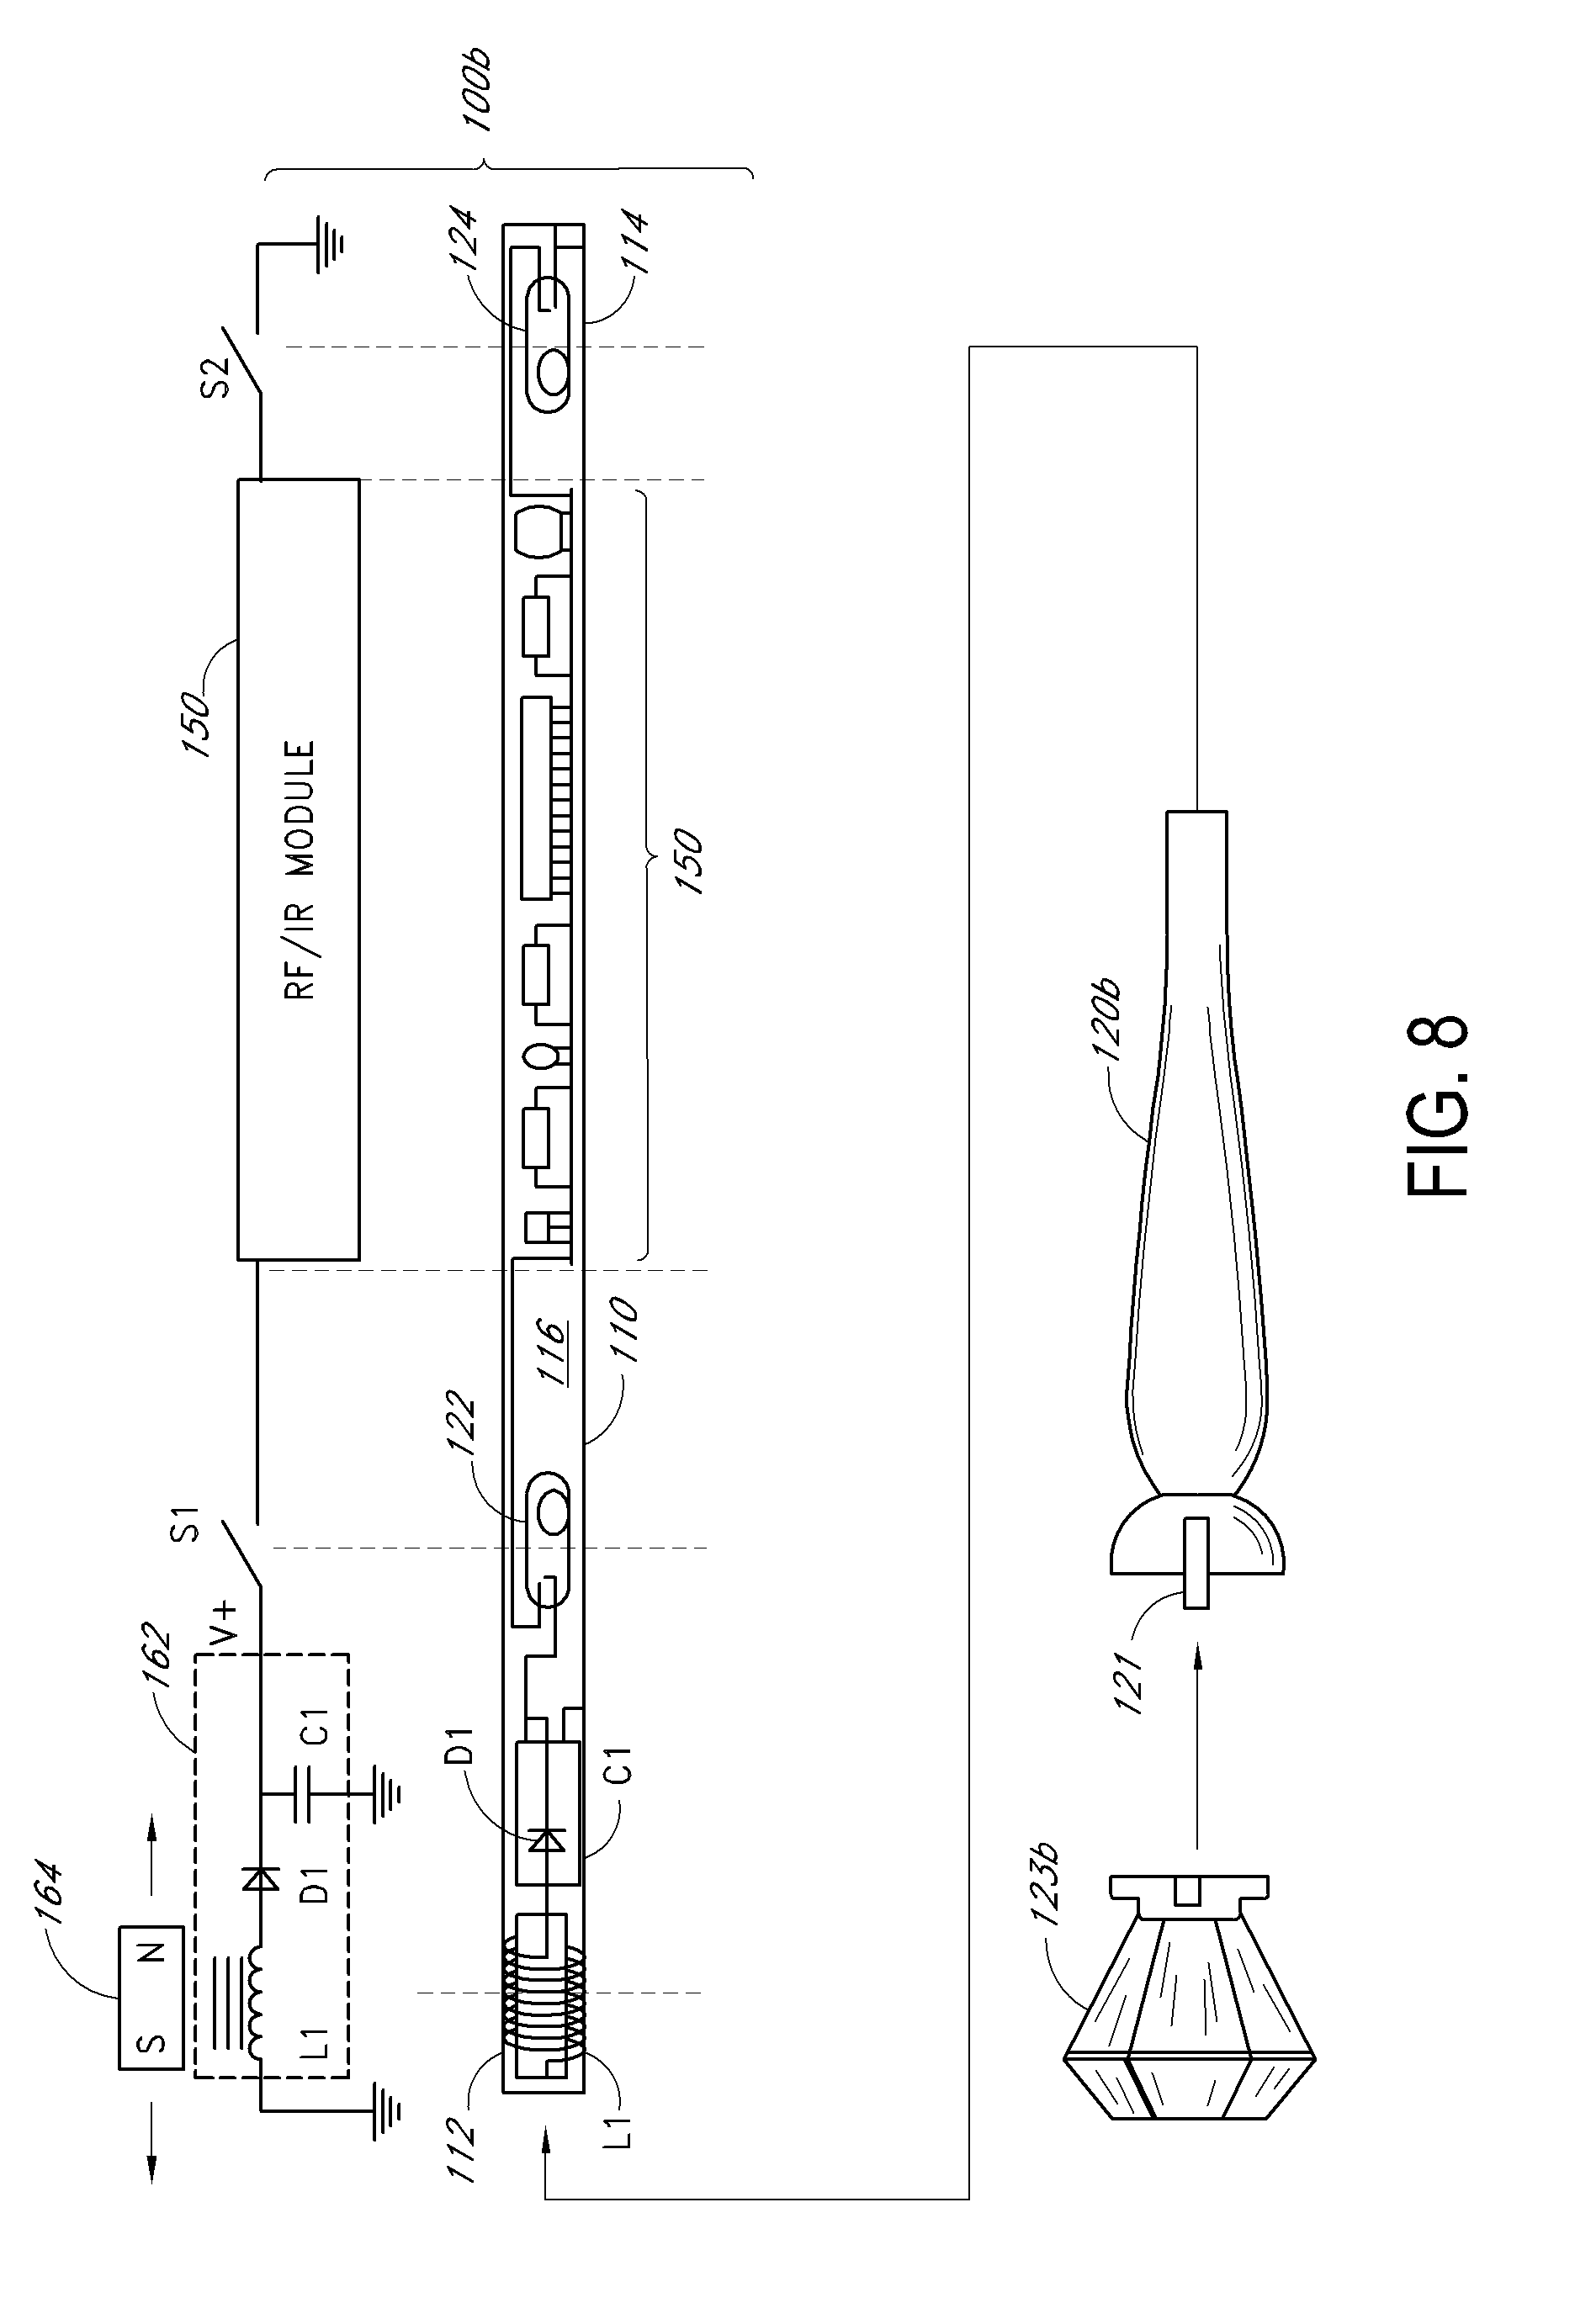 Sunpro Mini Tach Wiring Diagram from rpx-patents.s3.amazonaws.com